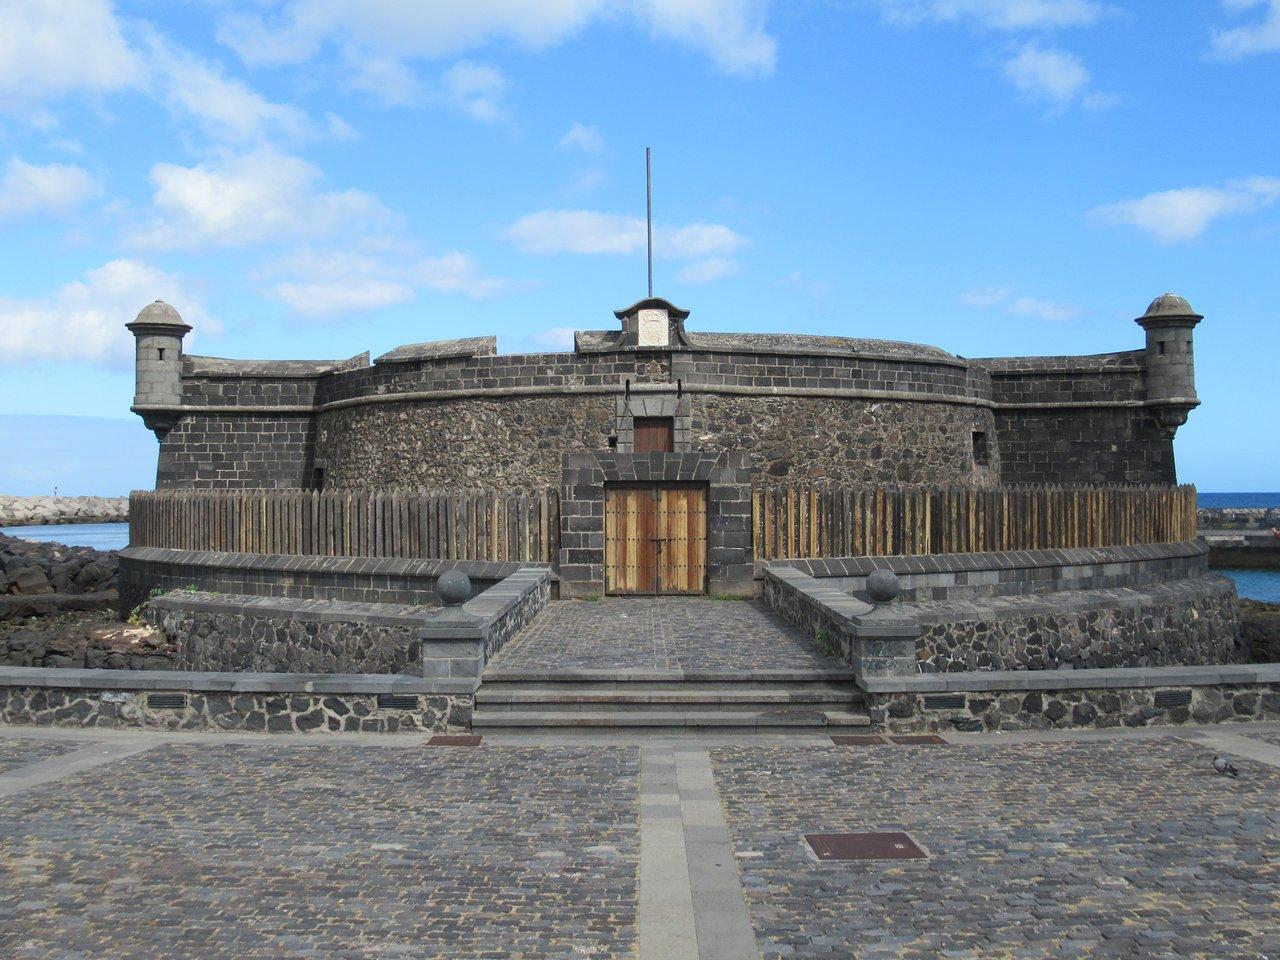 CASTILLO DE SAN JUAN (SANTA CRUZ DE TENERIFE)